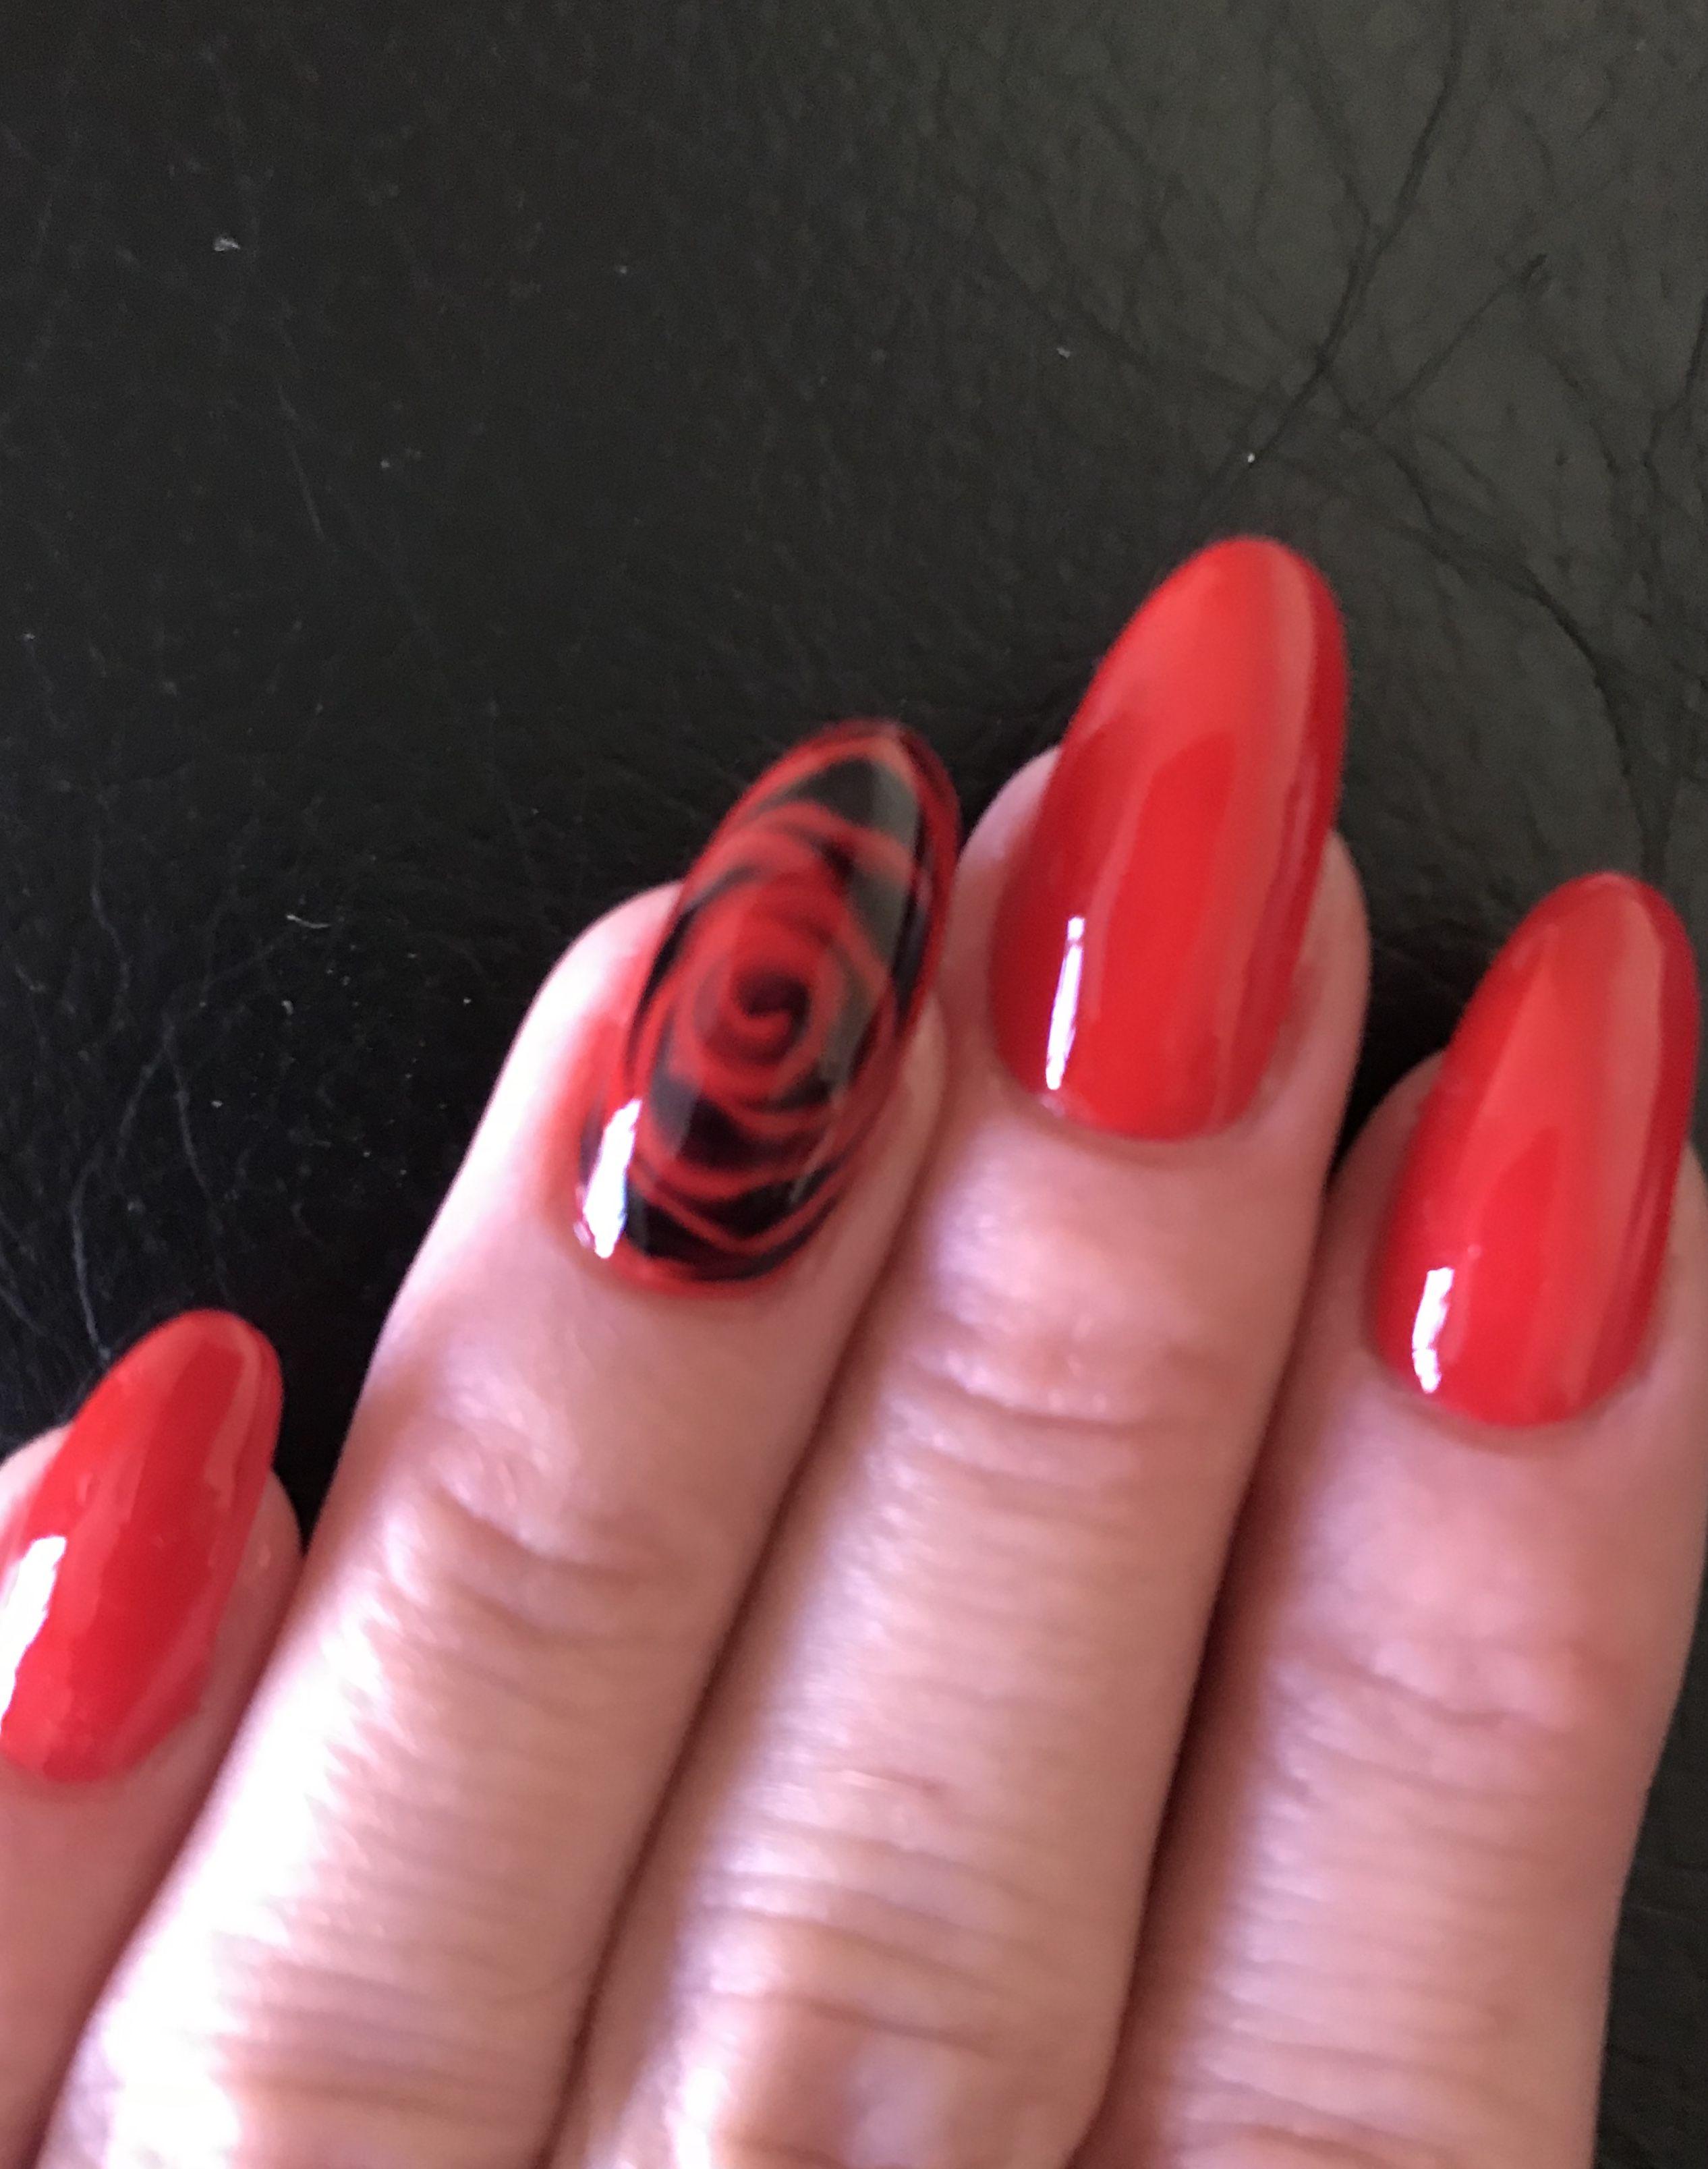 Black And Red Rose Nail Art Design Rose Nails Rose Nail Art